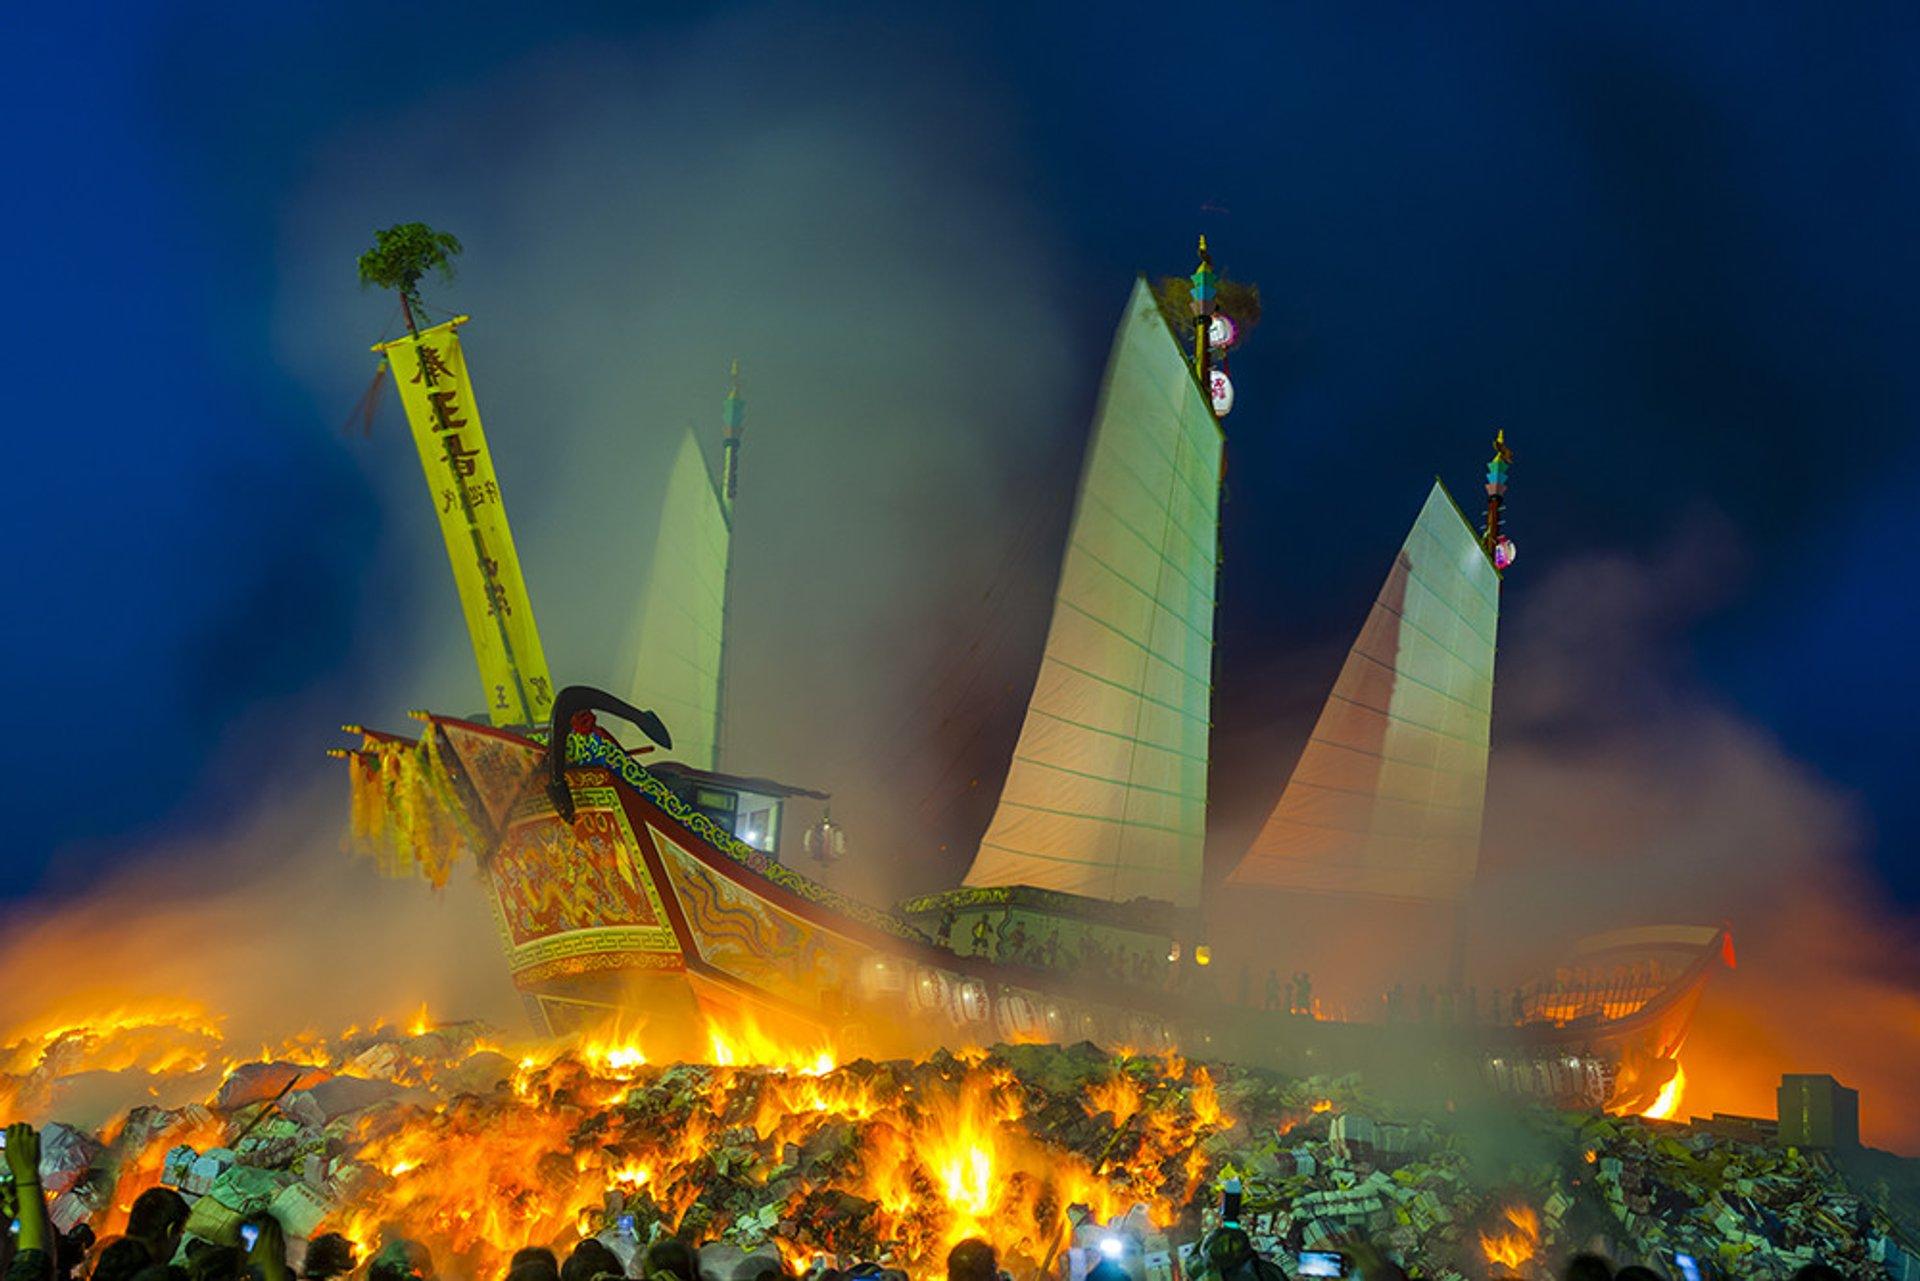 Wang Yeh Boat Burning Festival in Taiwan - Best Season 2020